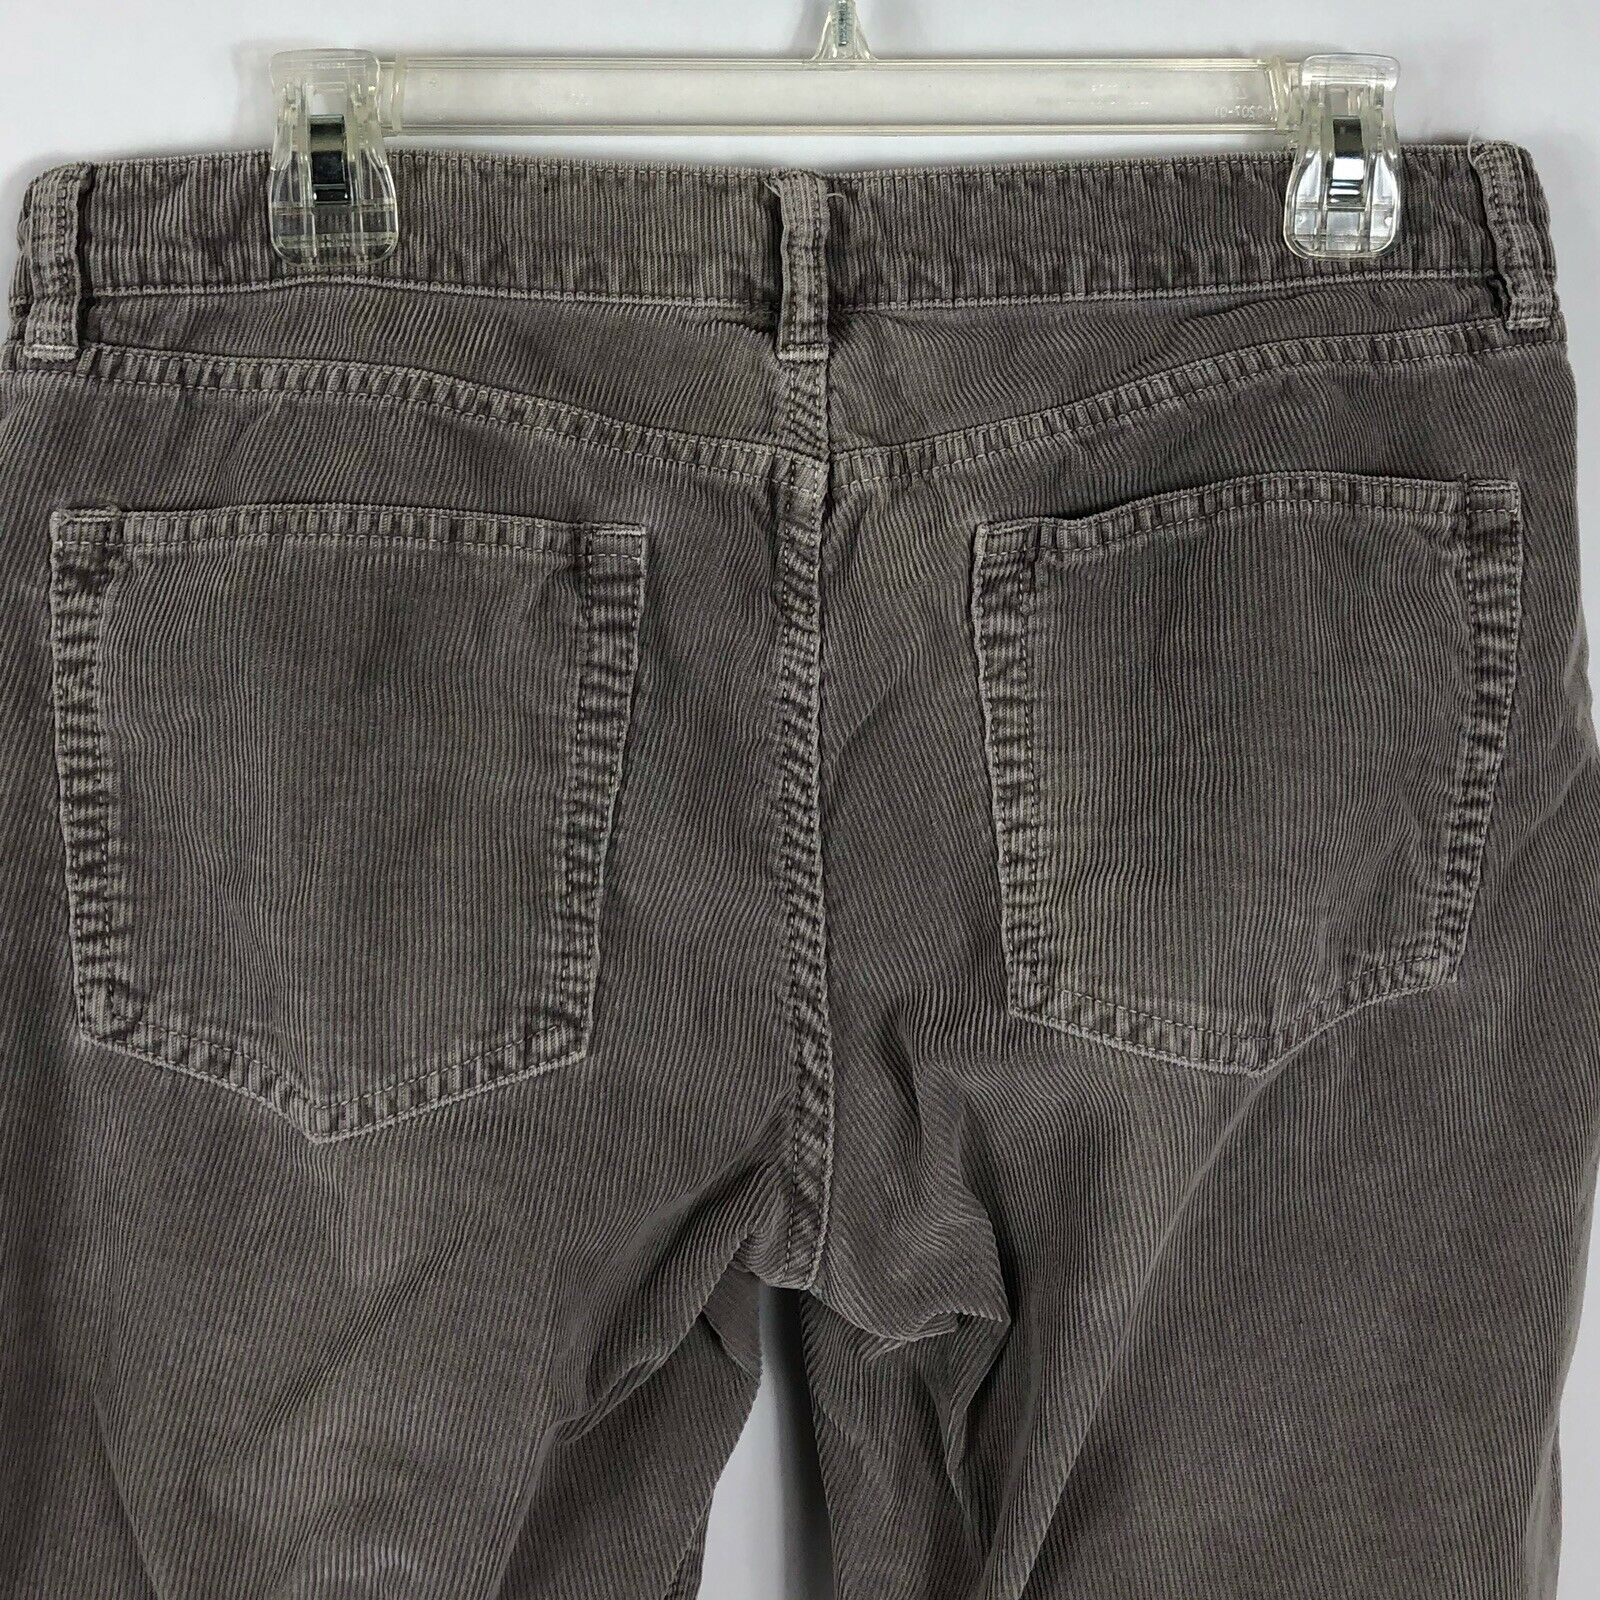 J. Crew Womens Size 30S Skinny Leg Corduroys City… - image 6